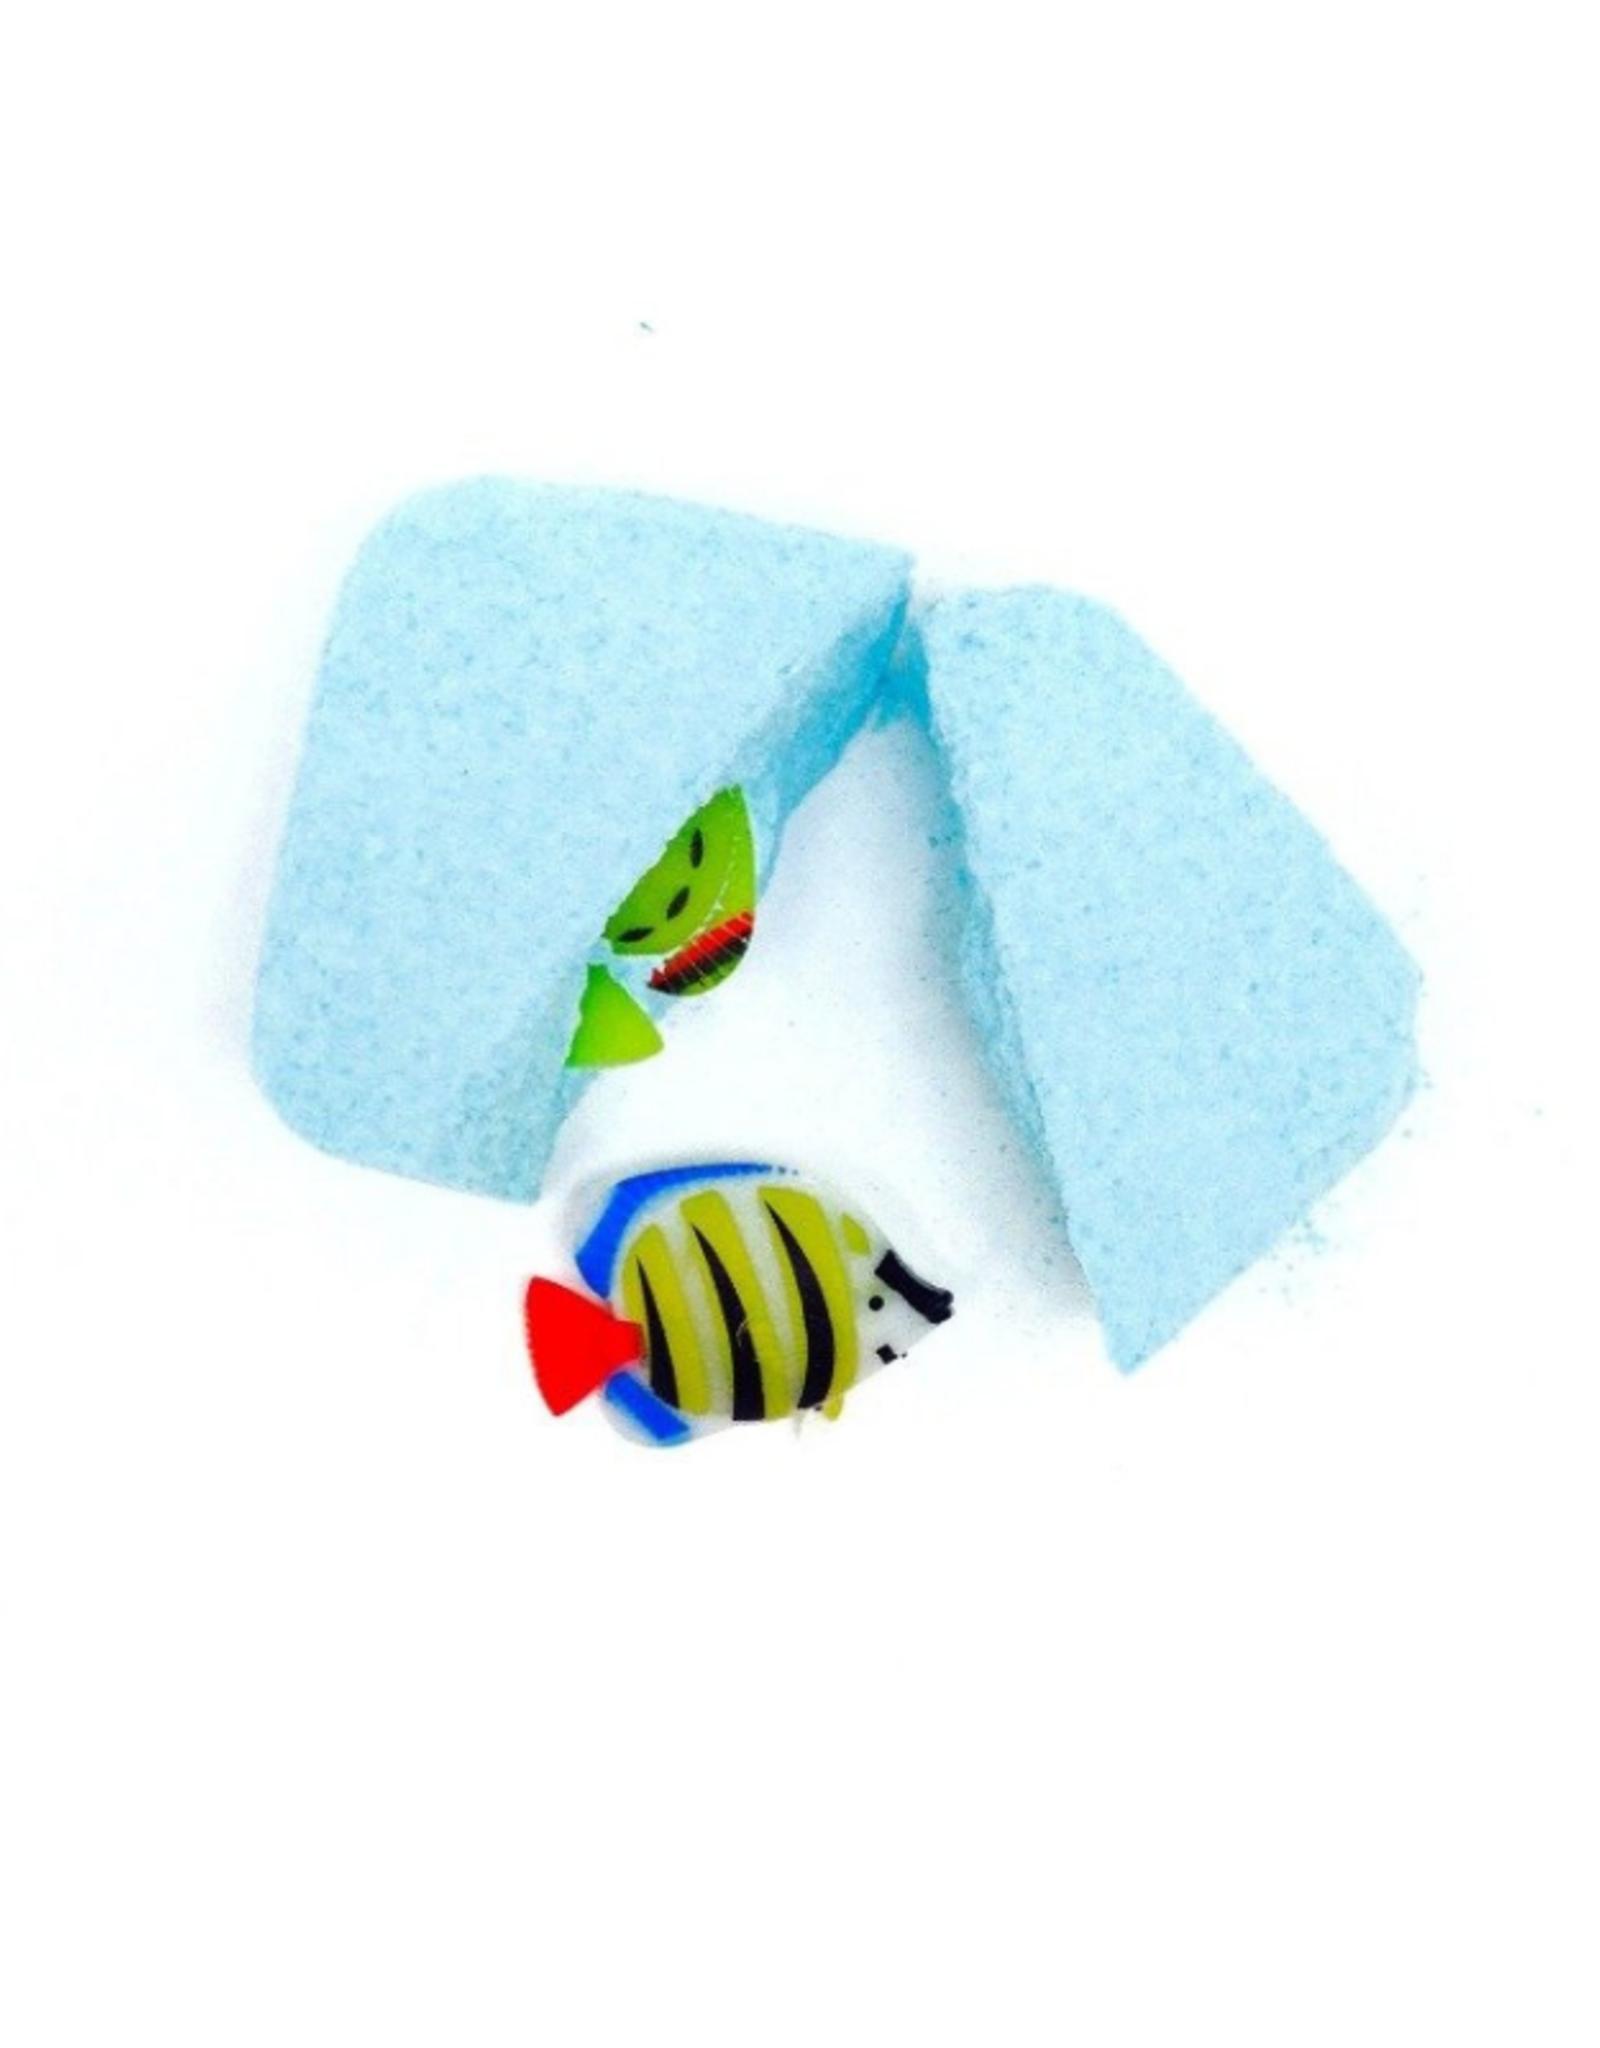 Feeling Smitten Cotton Candy Mystery Surprise Bag Bath Bomb